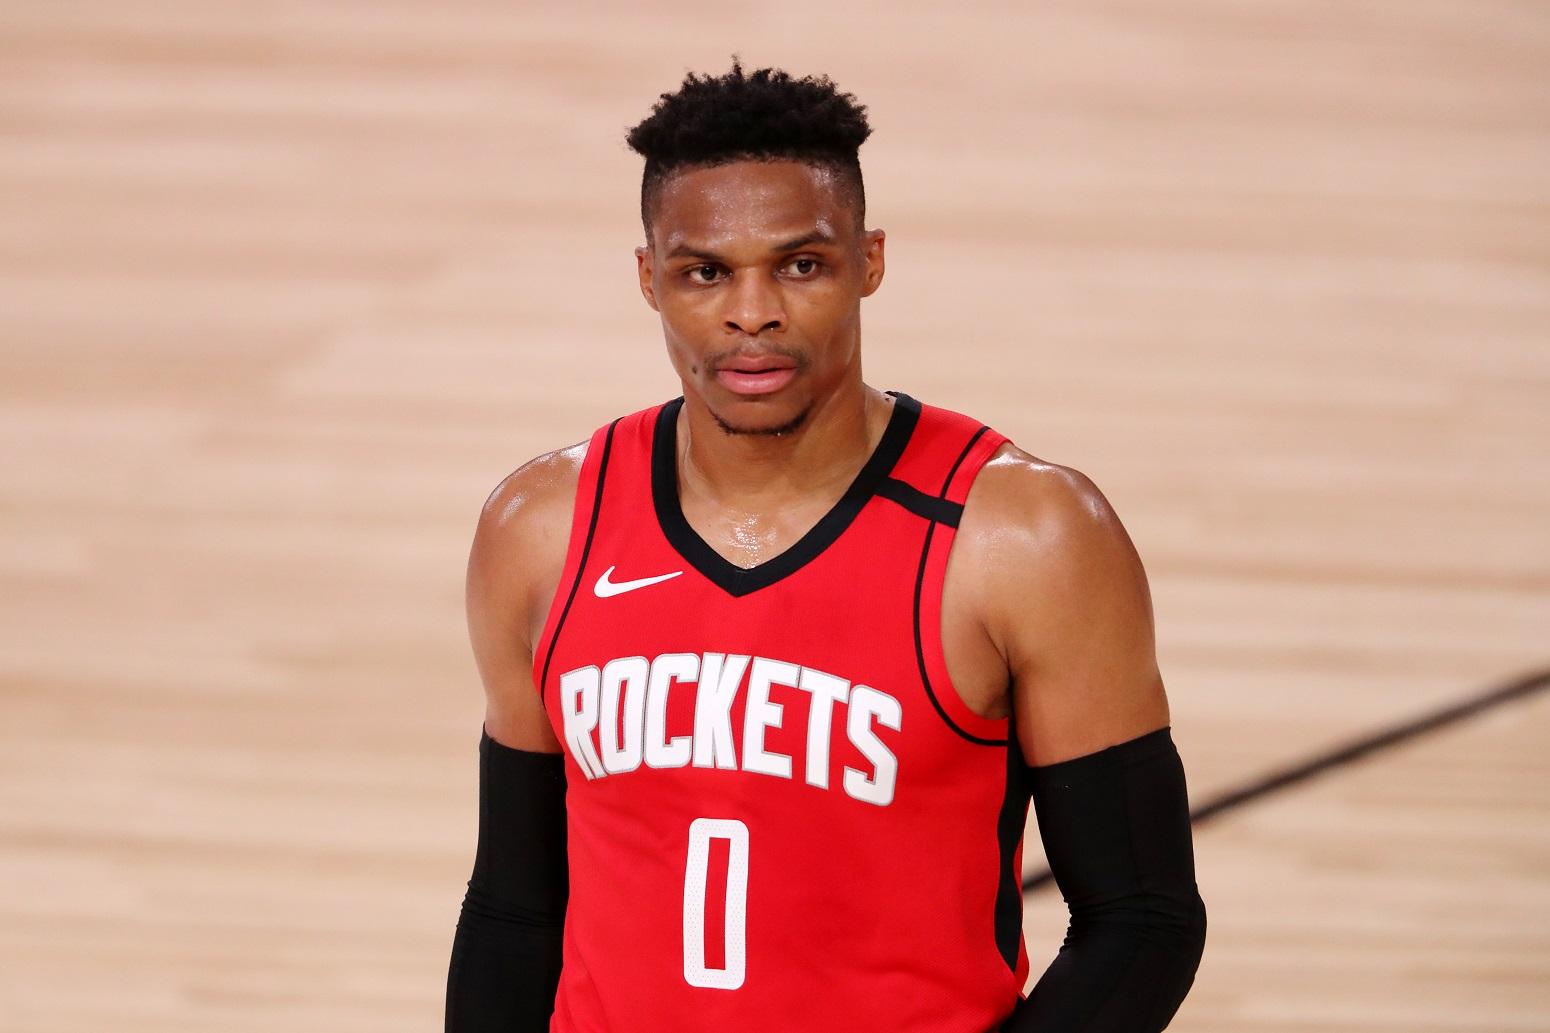 Russell Westbrook Rockets NBA